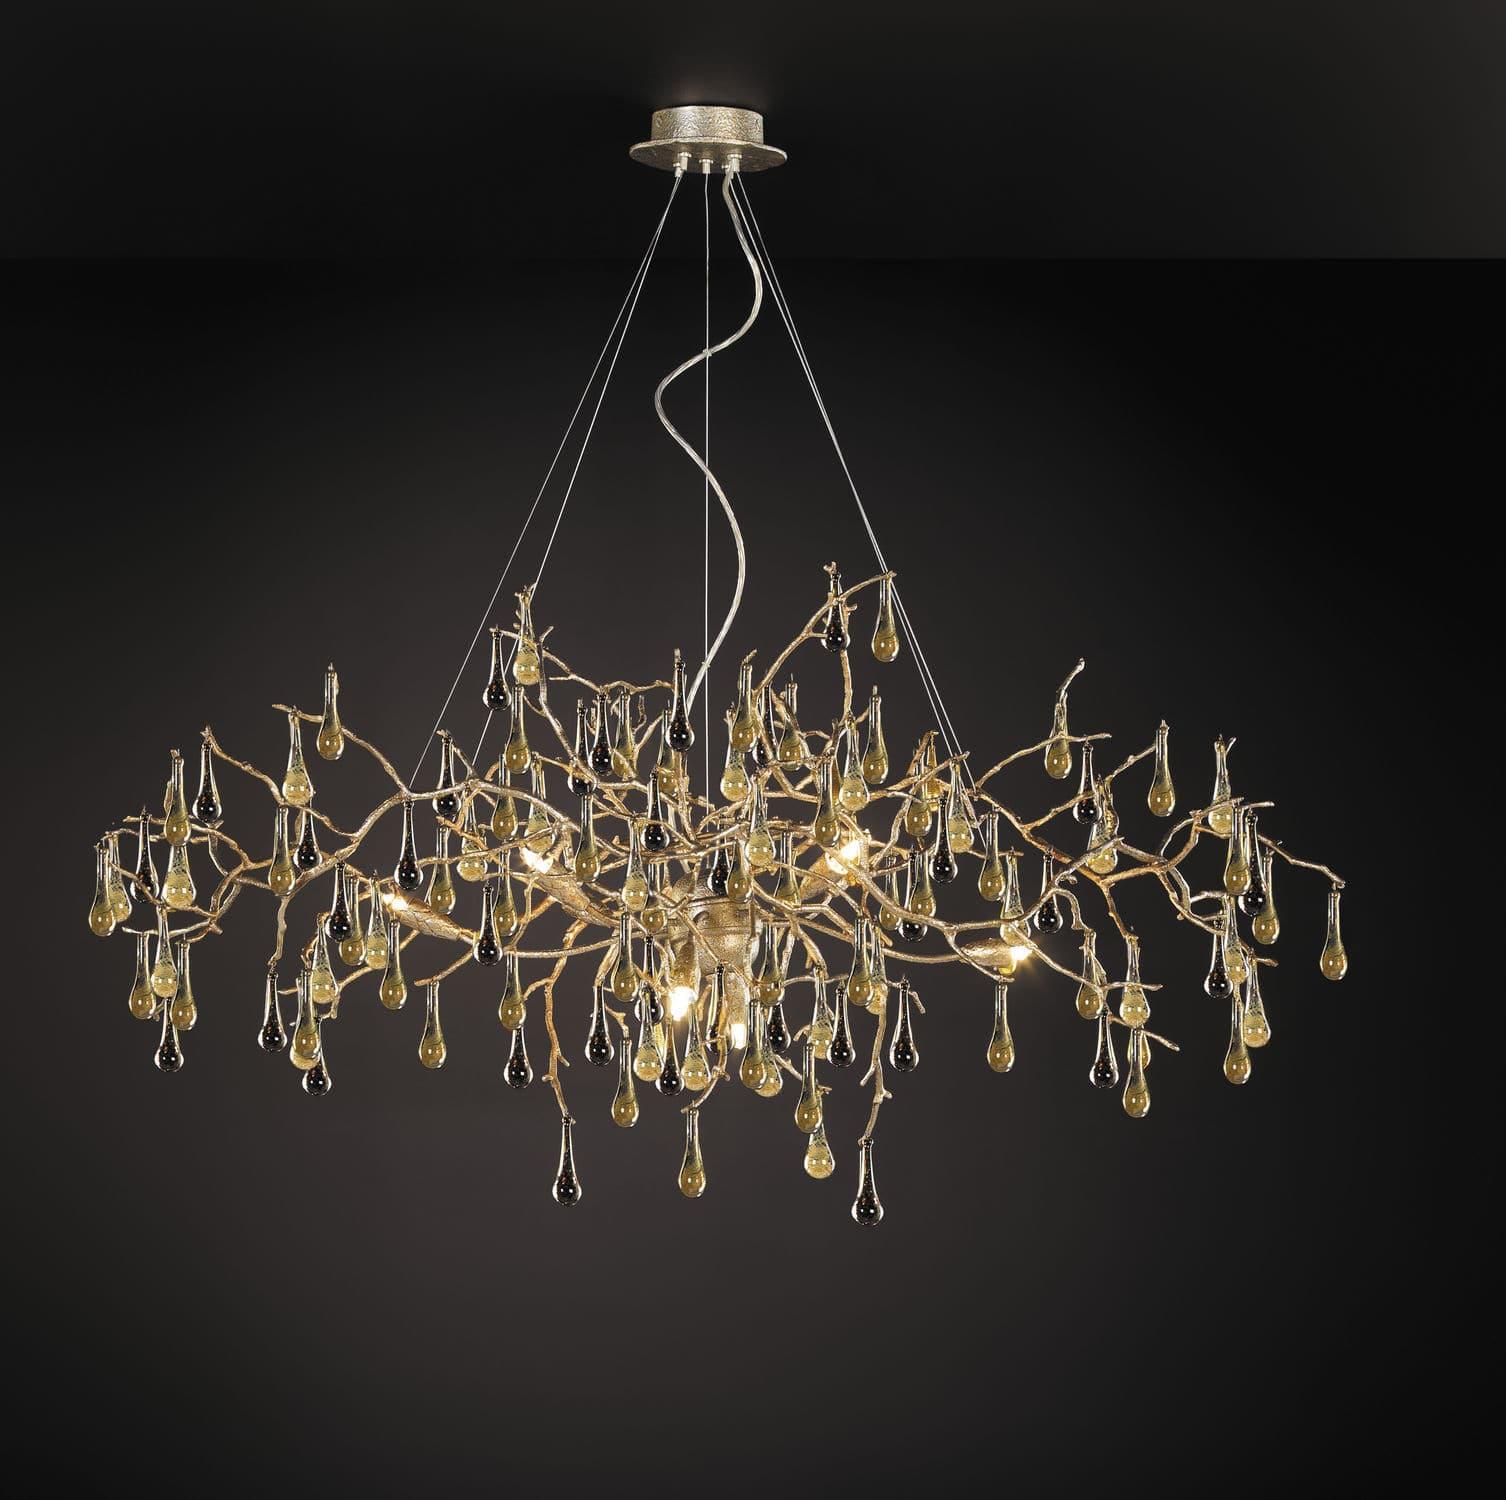 Traditional chandelier glass bronze halogen bijout traditional chandelier glass bronze halogen bijout ct32688 arubaitofo Image collections